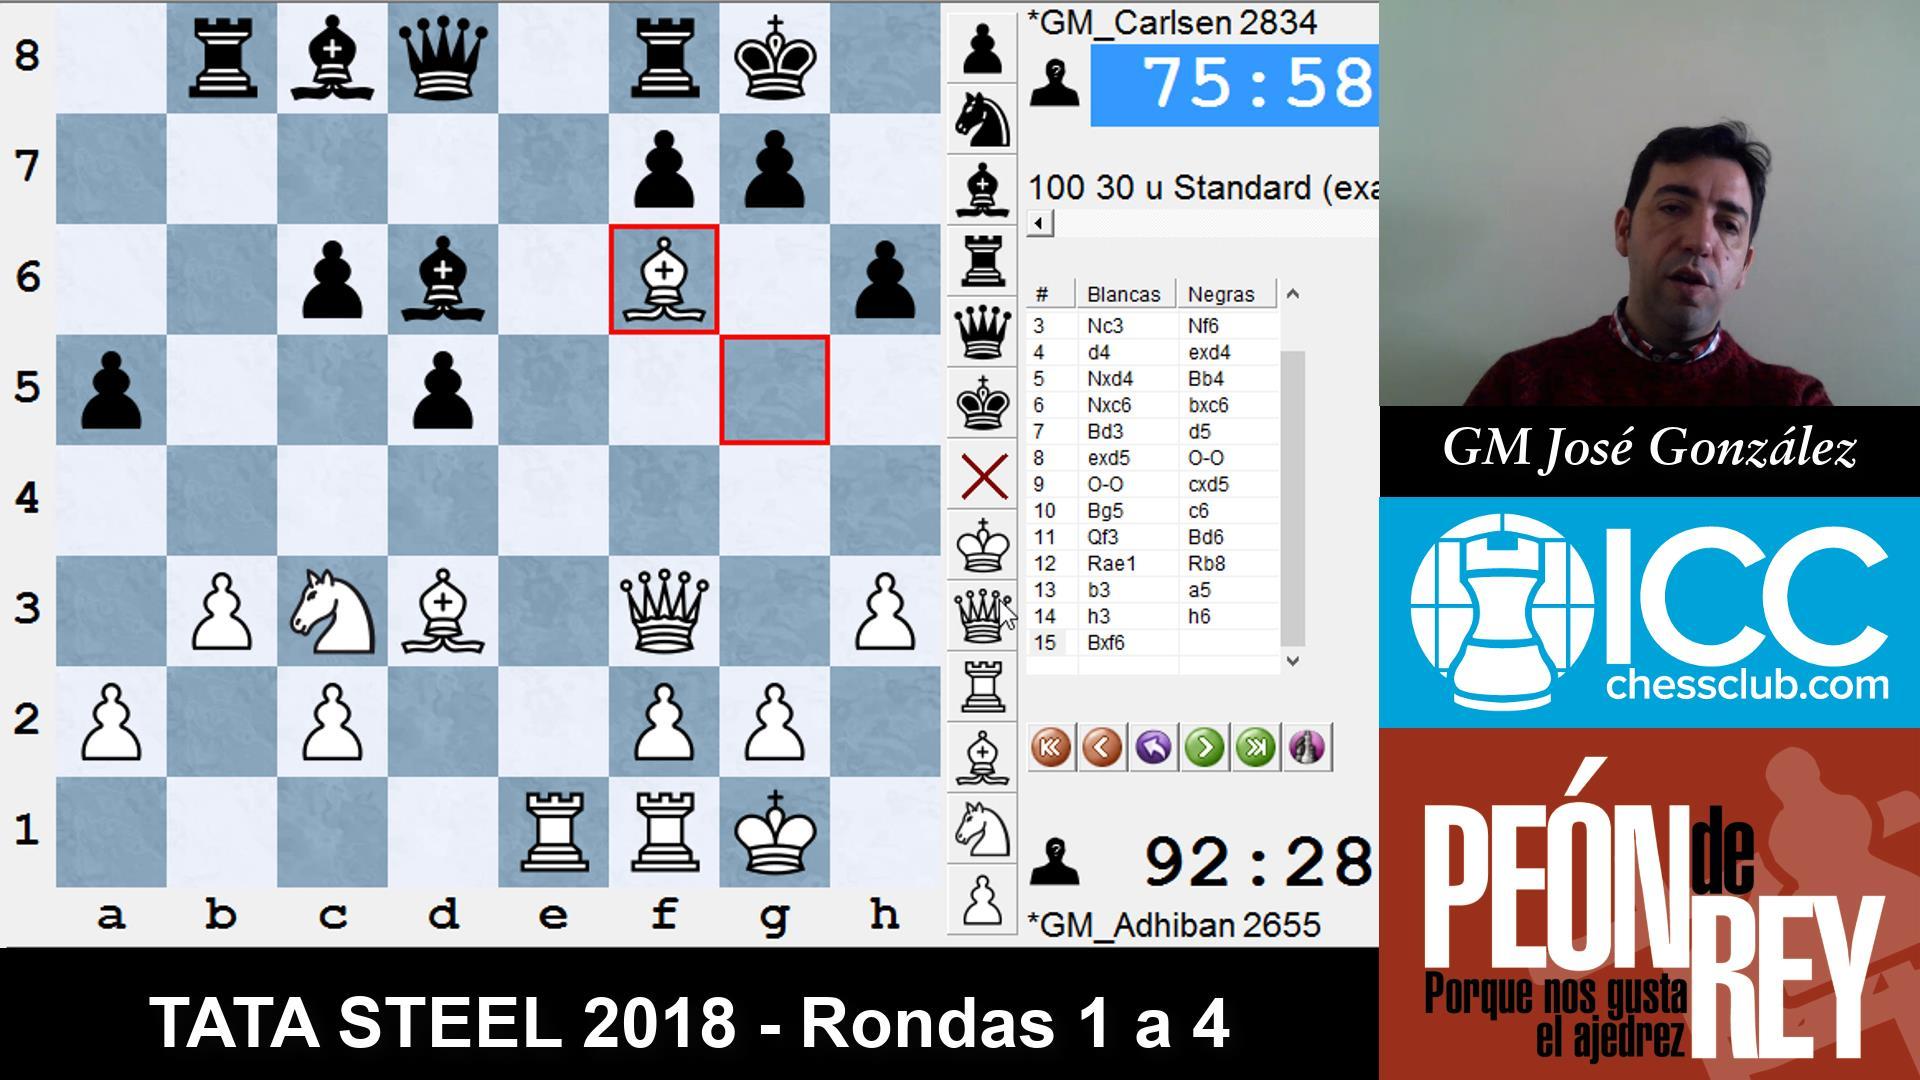 TATA STEEL 2018 - resumen R1-4 (GM José González)